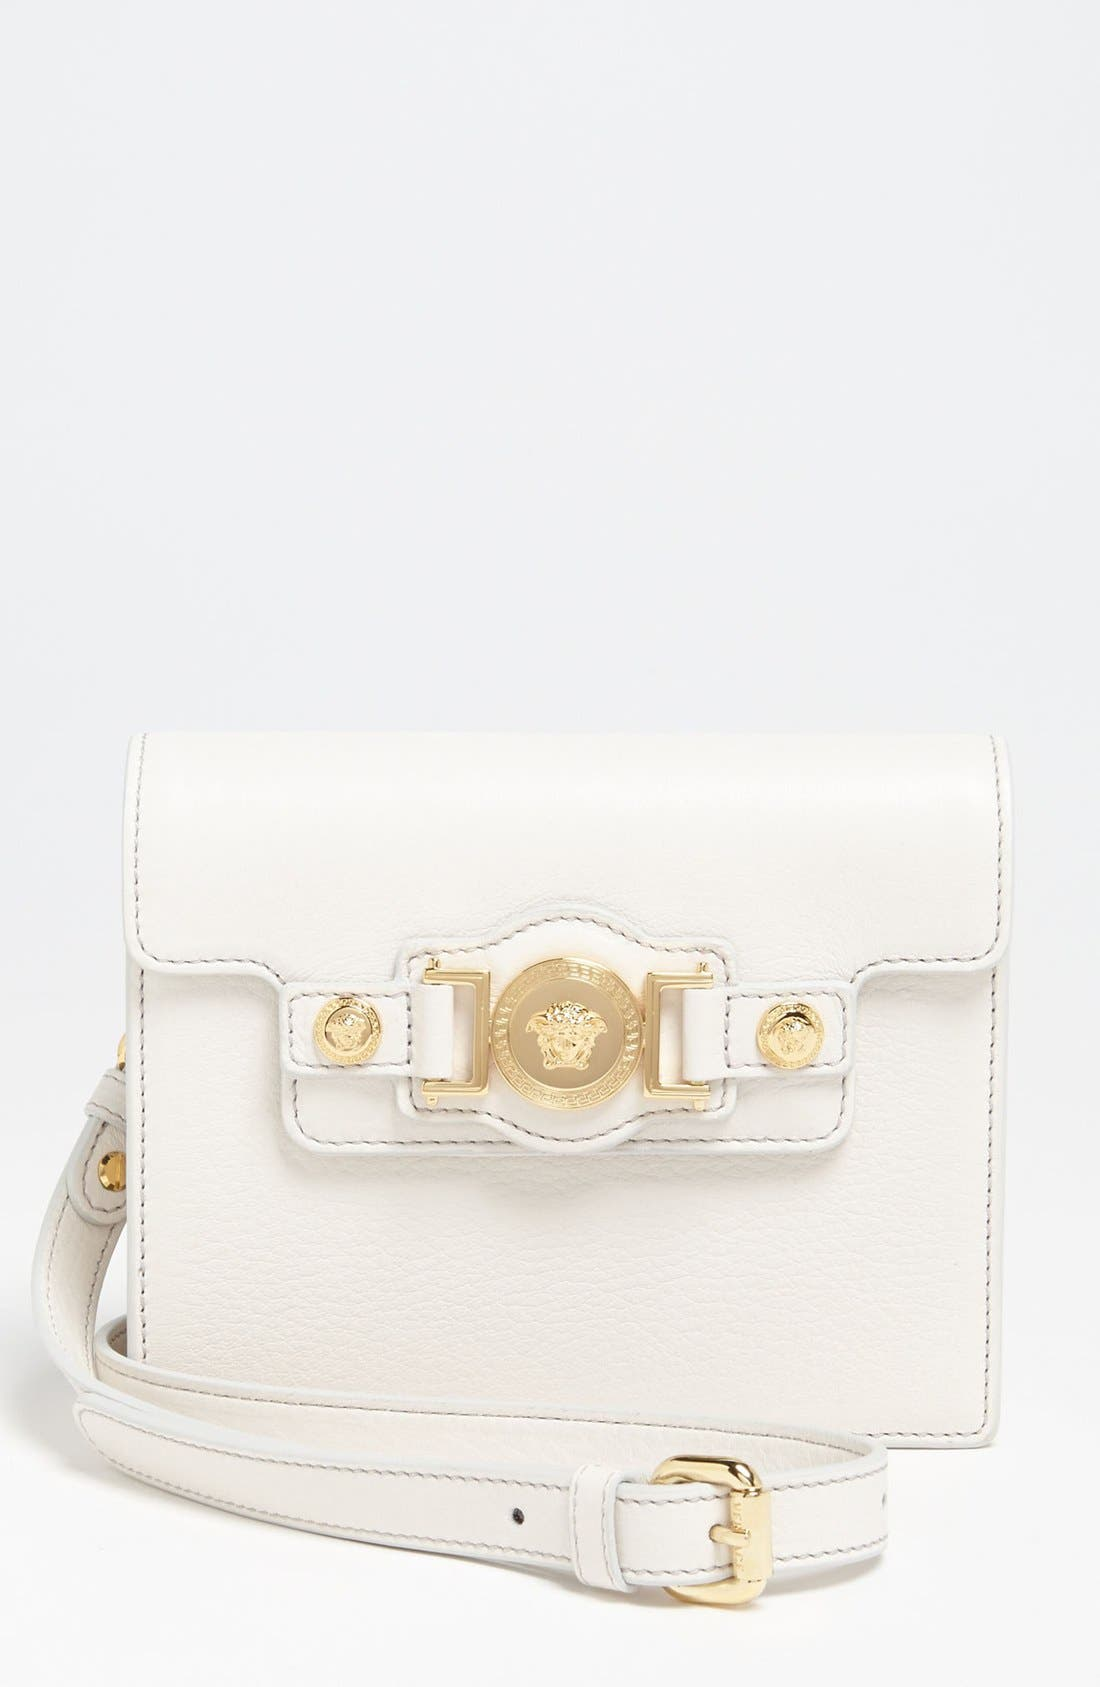 Main Image - Versace 'Mini - Medusa' Leather Crossbody Bag